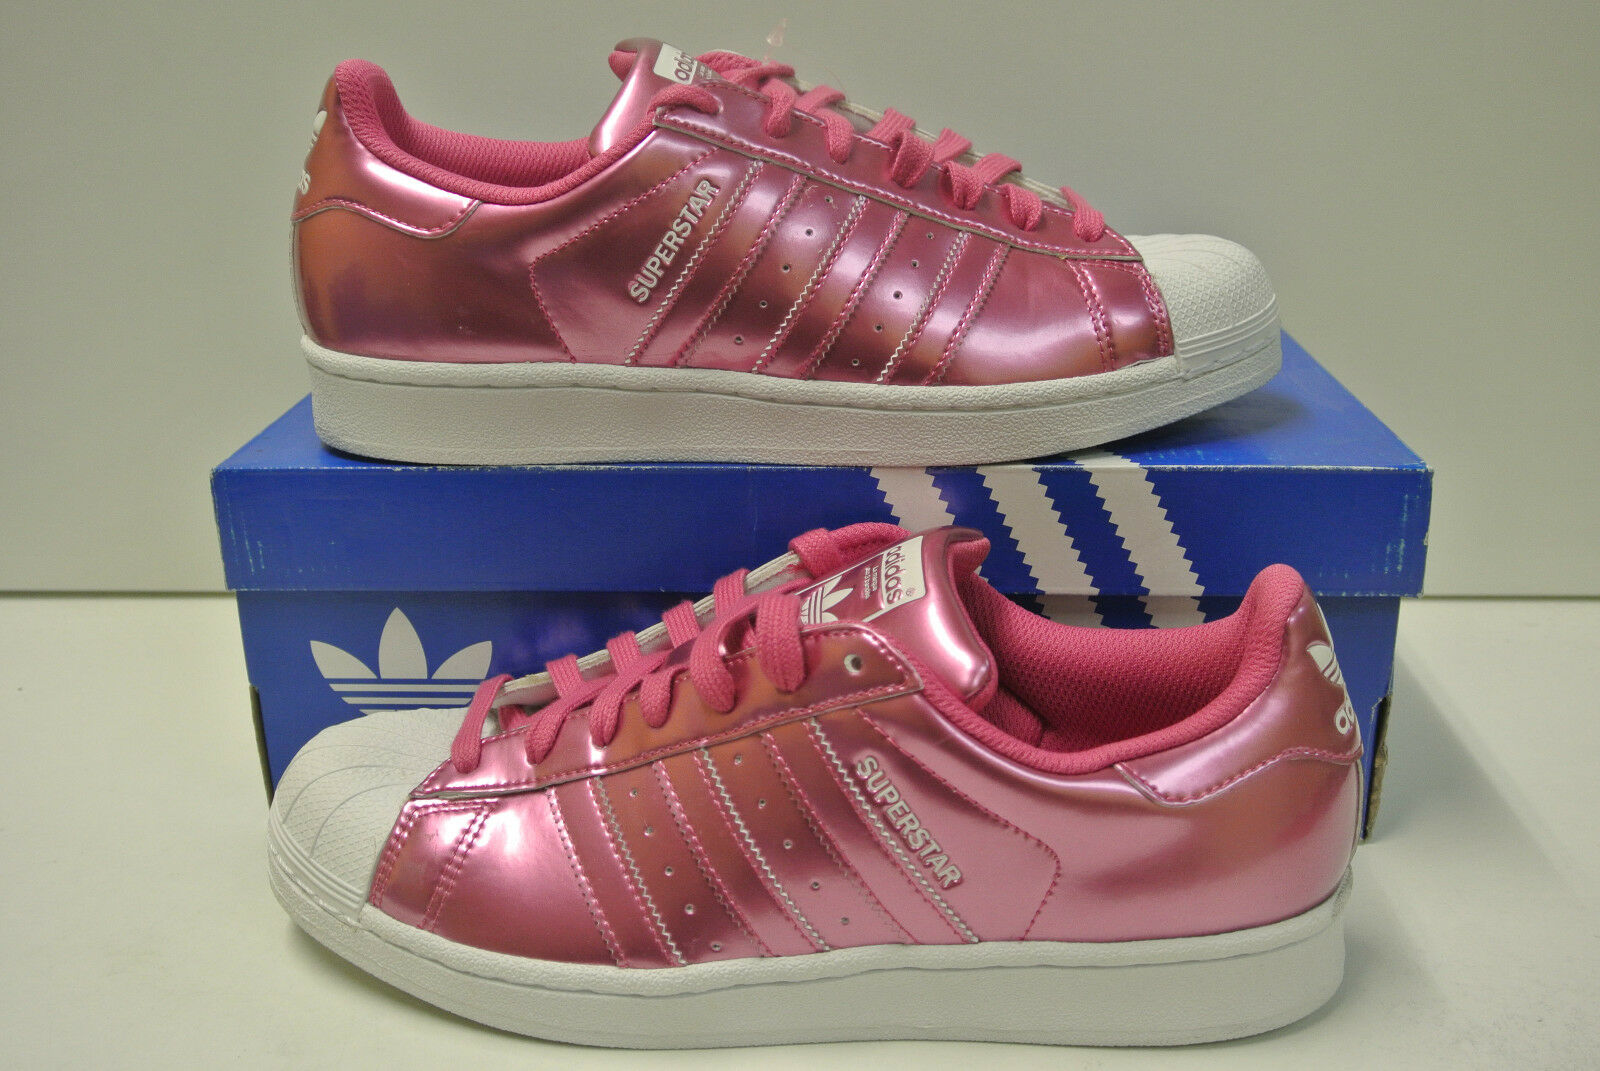 Adidas Superstar W Gr. Sélectionnable Neuf et Emballage D'Origine AQ2868